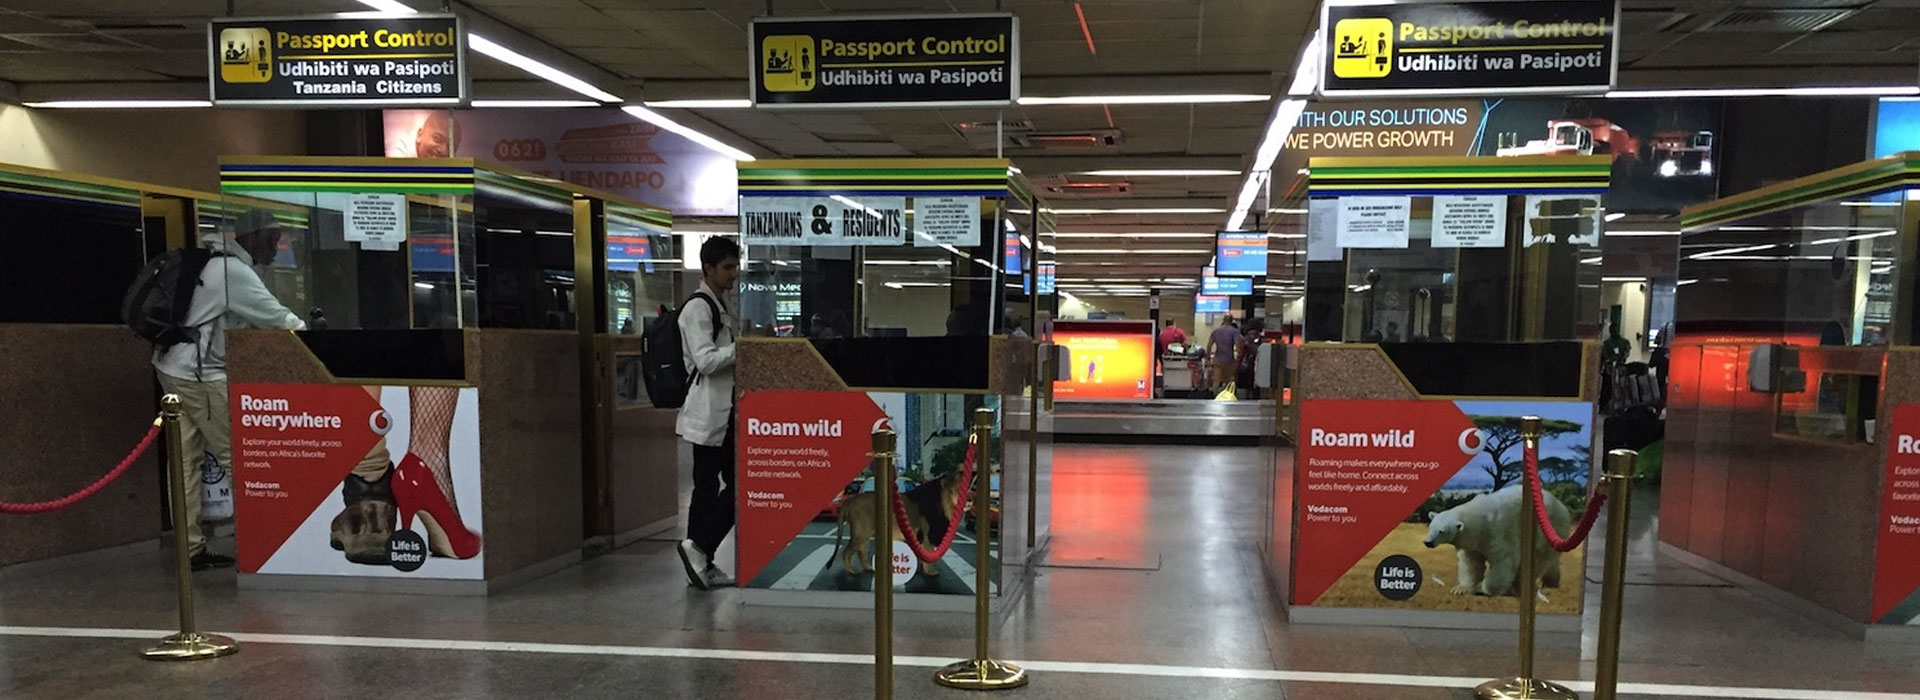 Tanzania Visa & Immigration